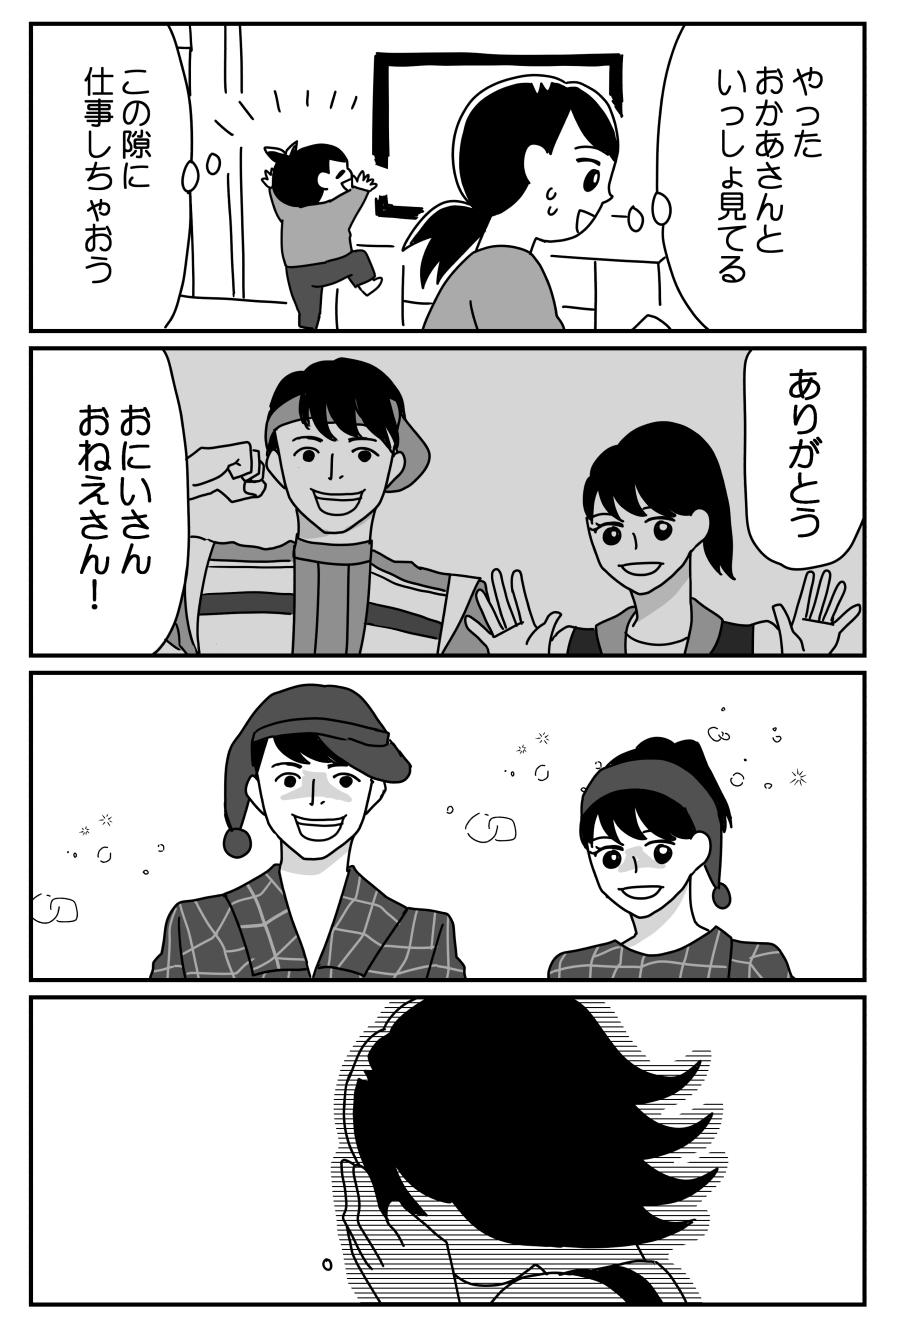 f:id:kanemotonomukuu:20200210172047j:plain